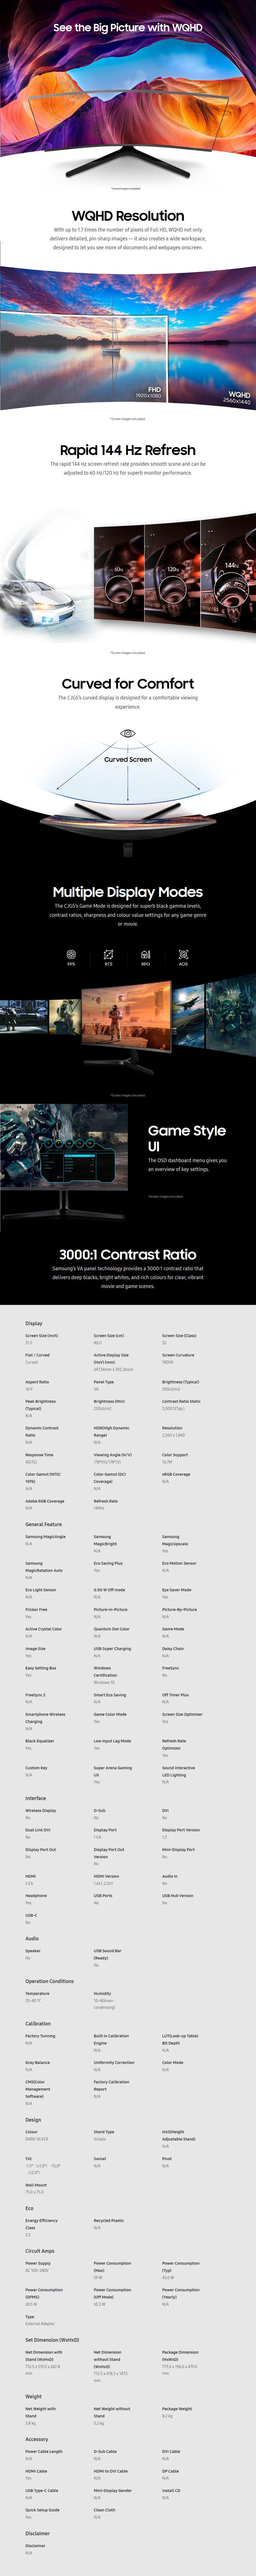 "Samsung CJG5 32"" 144Hz WQHD VA Curved Gaming Monitor - Desktop Overview 1"